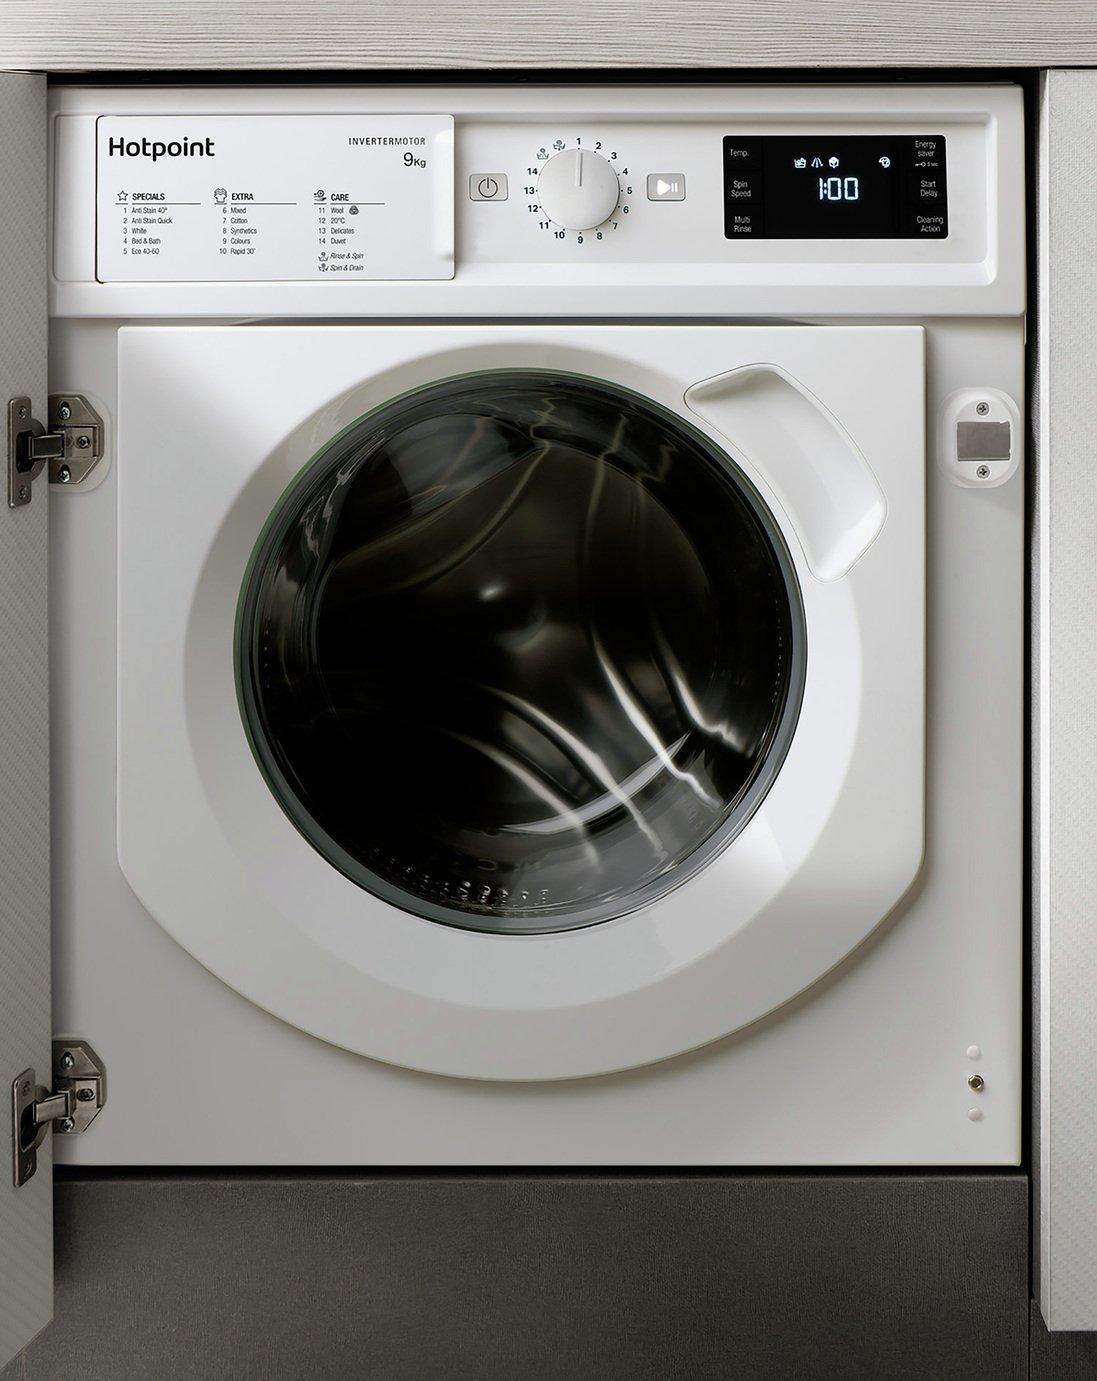 Hotpoint BIWMHG91484 9KG Integrated Washing Machine - White